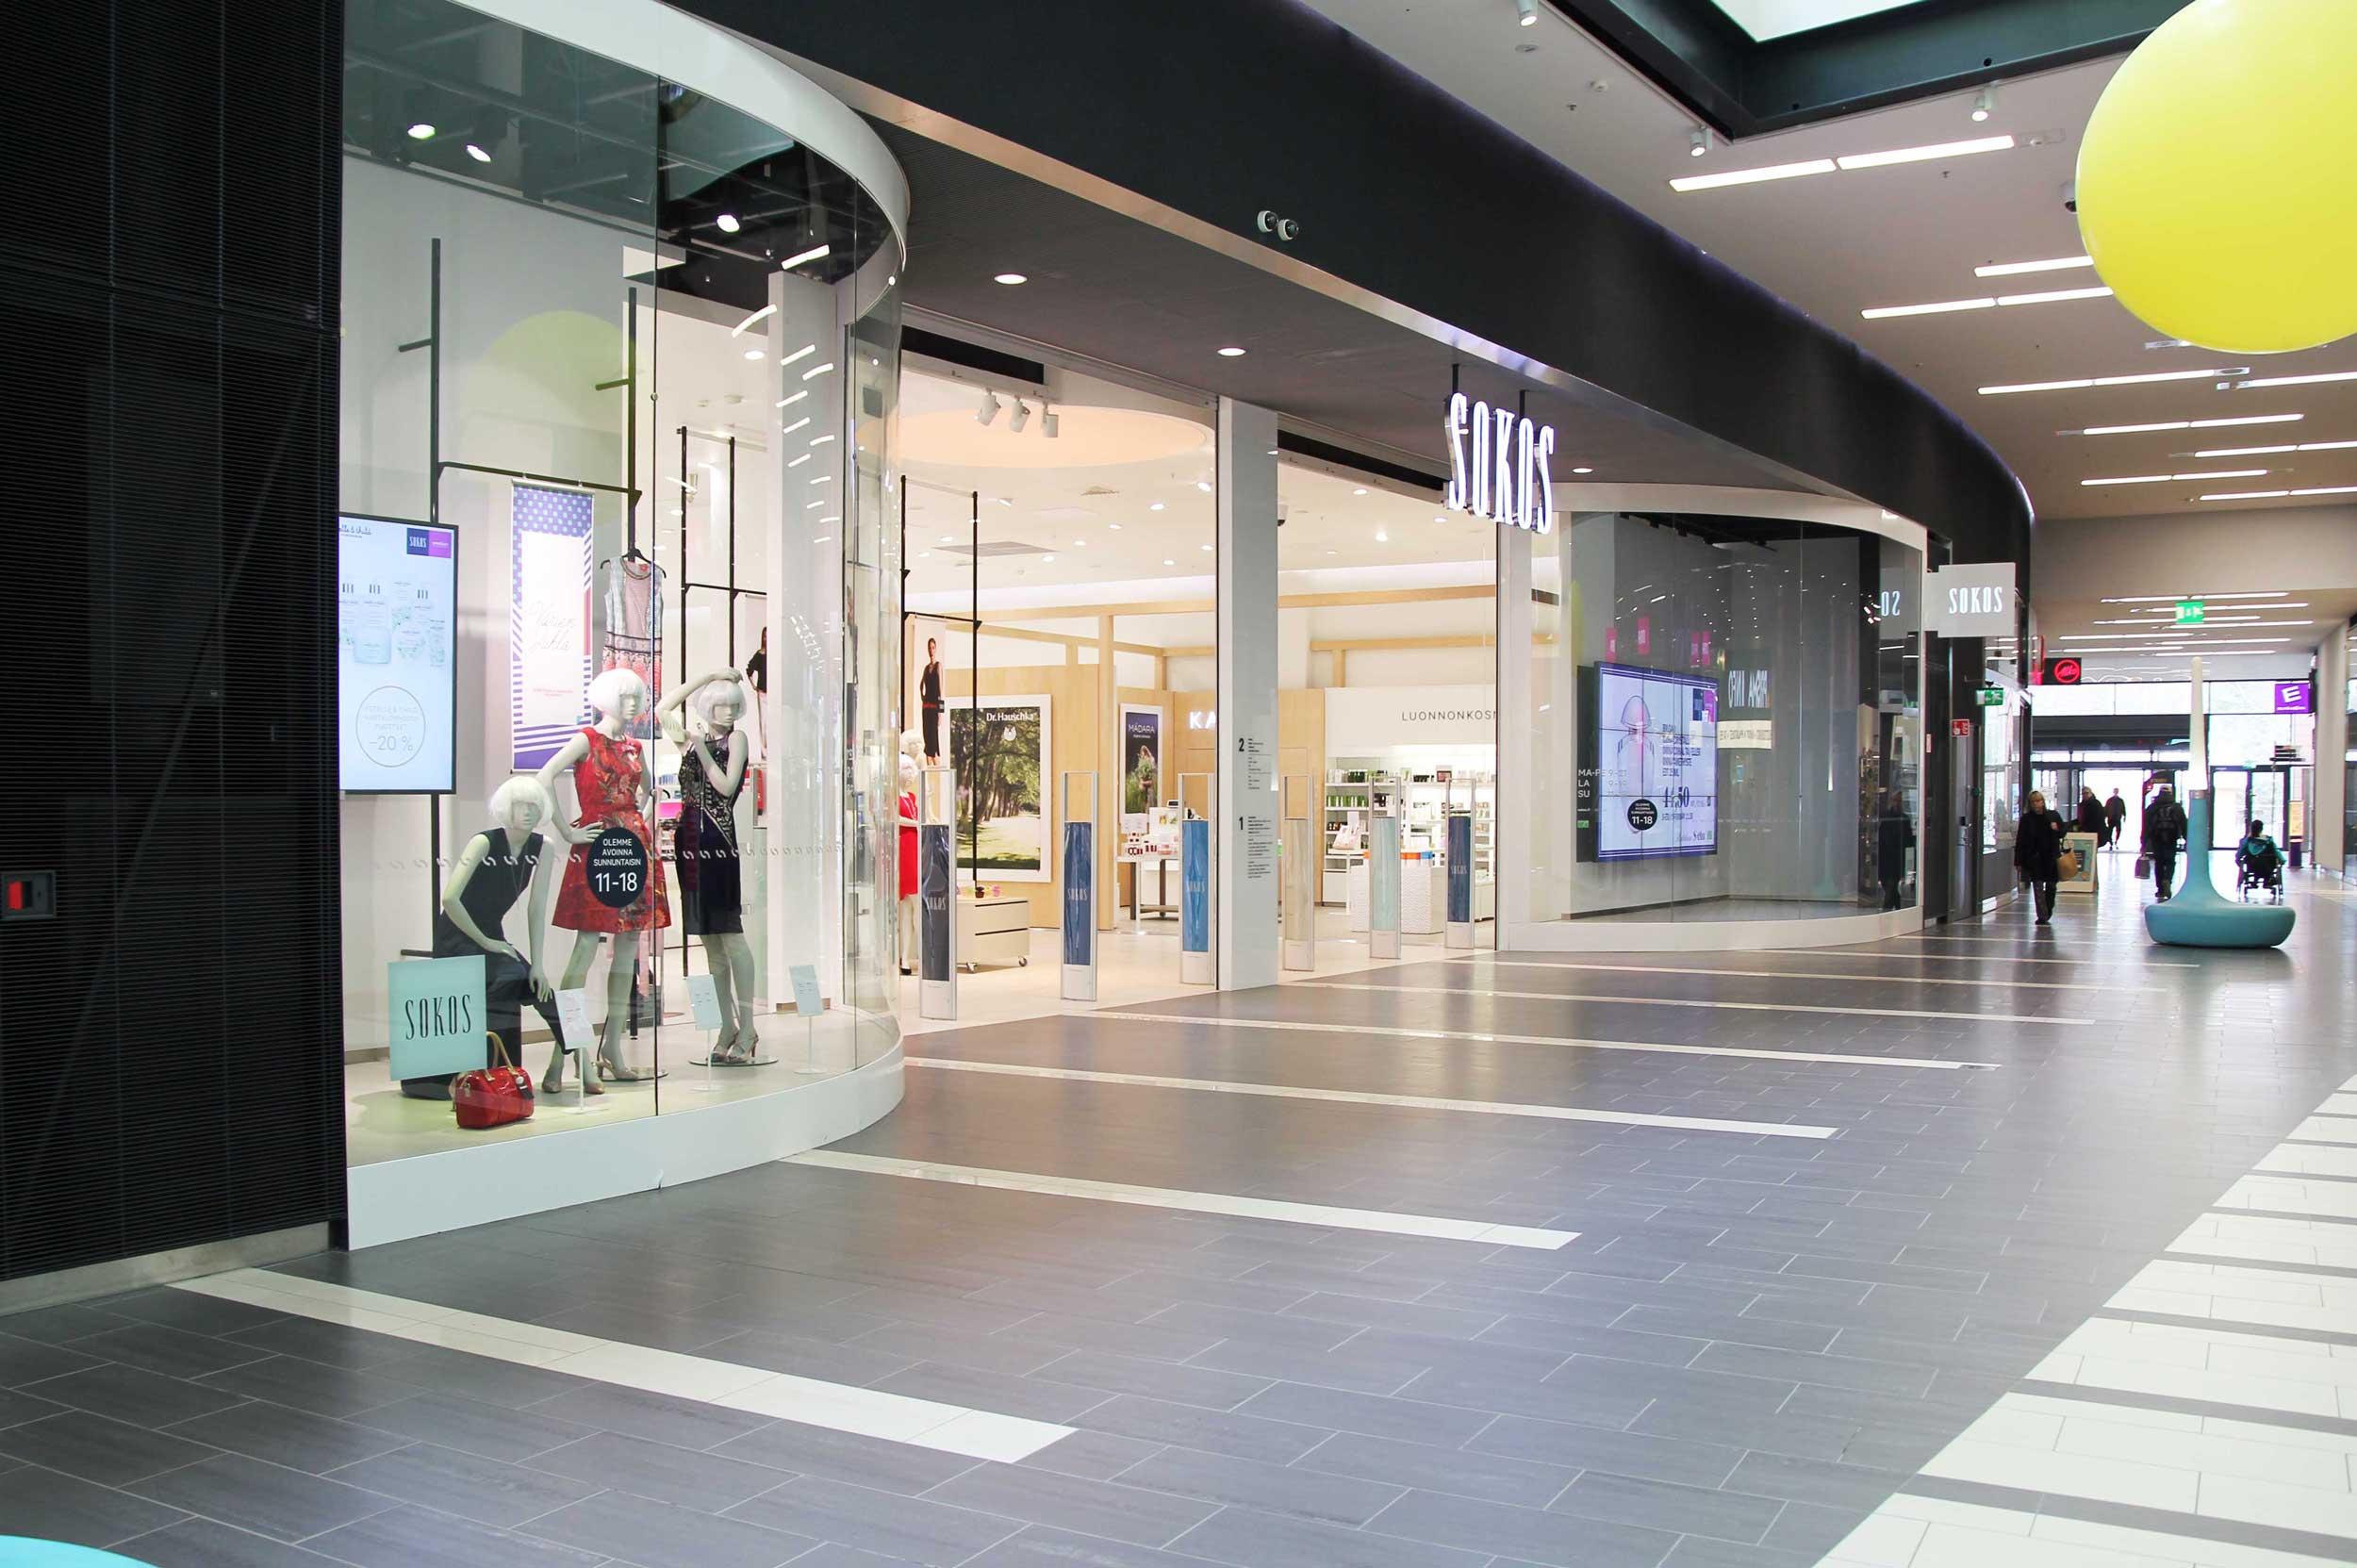 Scanmikael_Shopping centre concept_Kaari, Helsinki